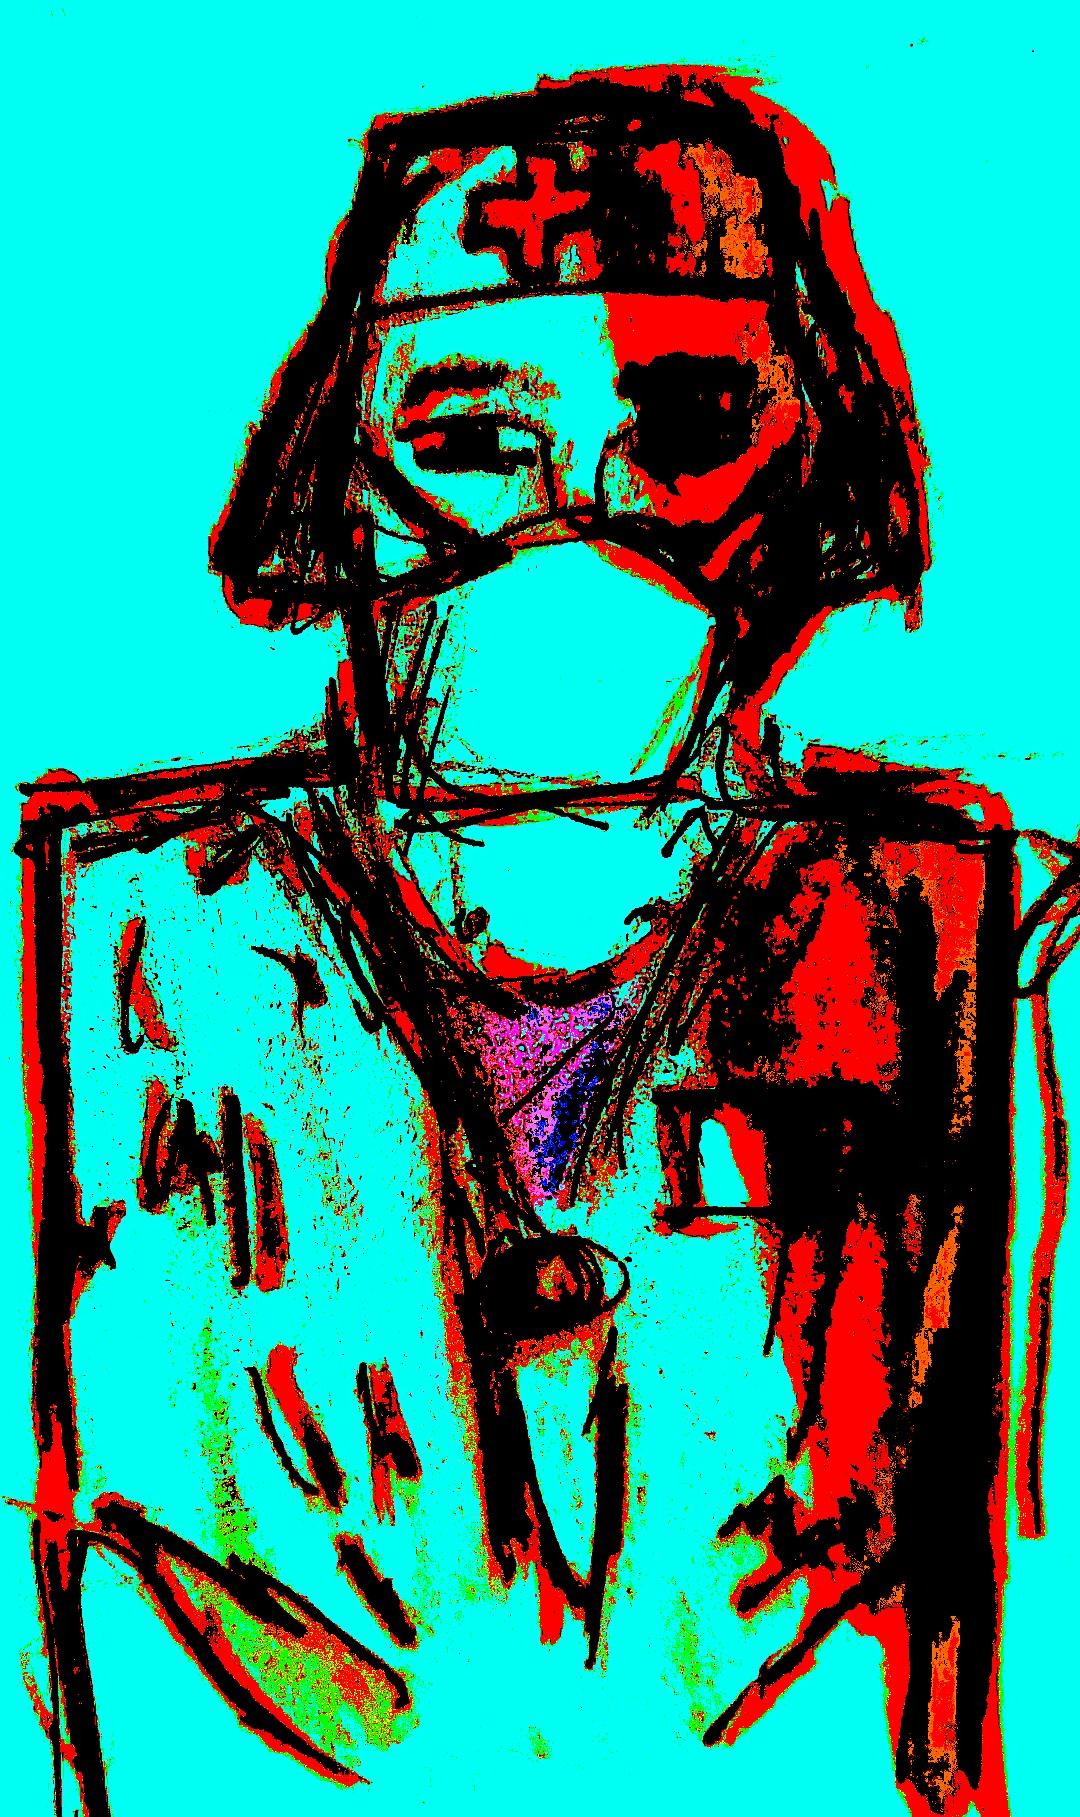 #4 Abel, infirmier libéral